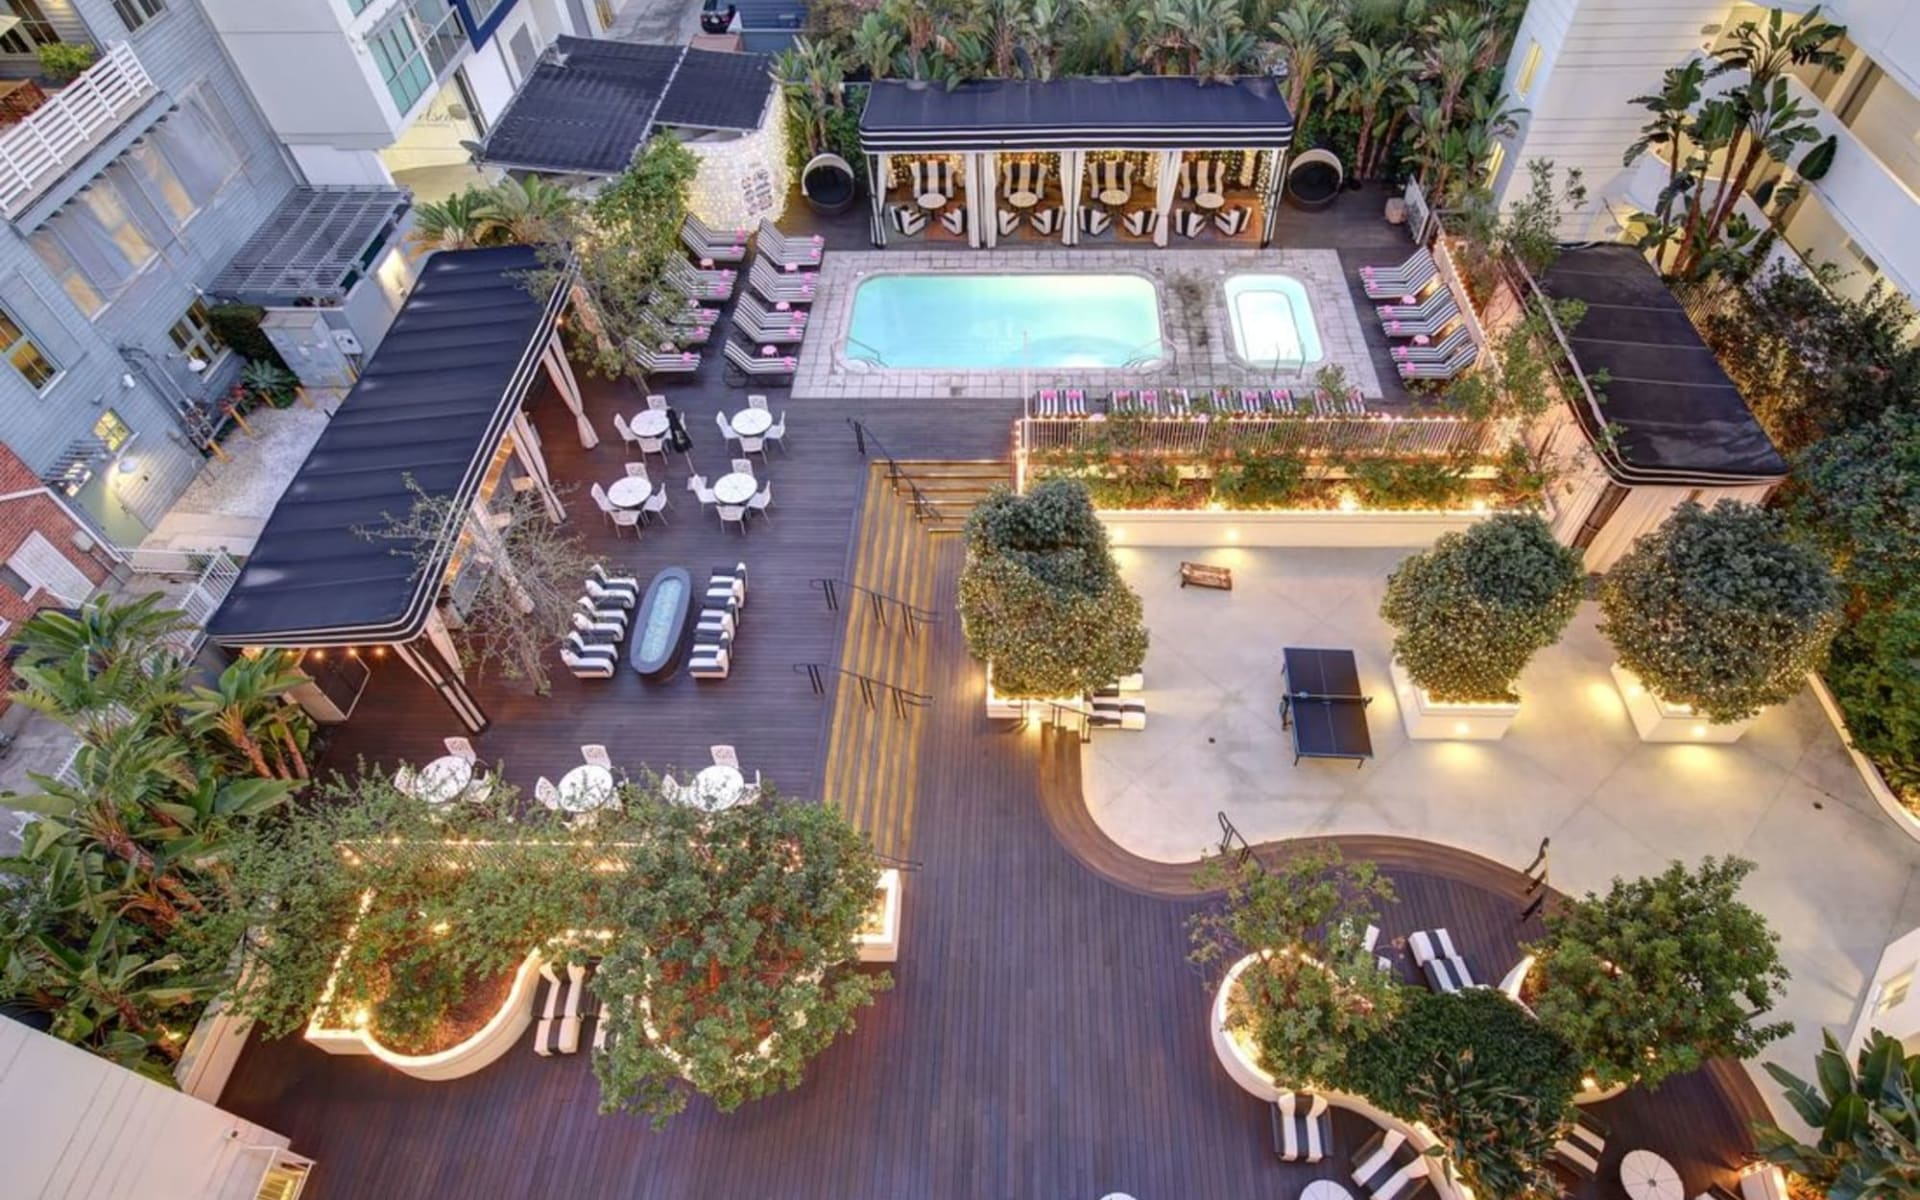 Shangri-La Hotel in Santa Monica:  Shangri La - Courtyard at nightime